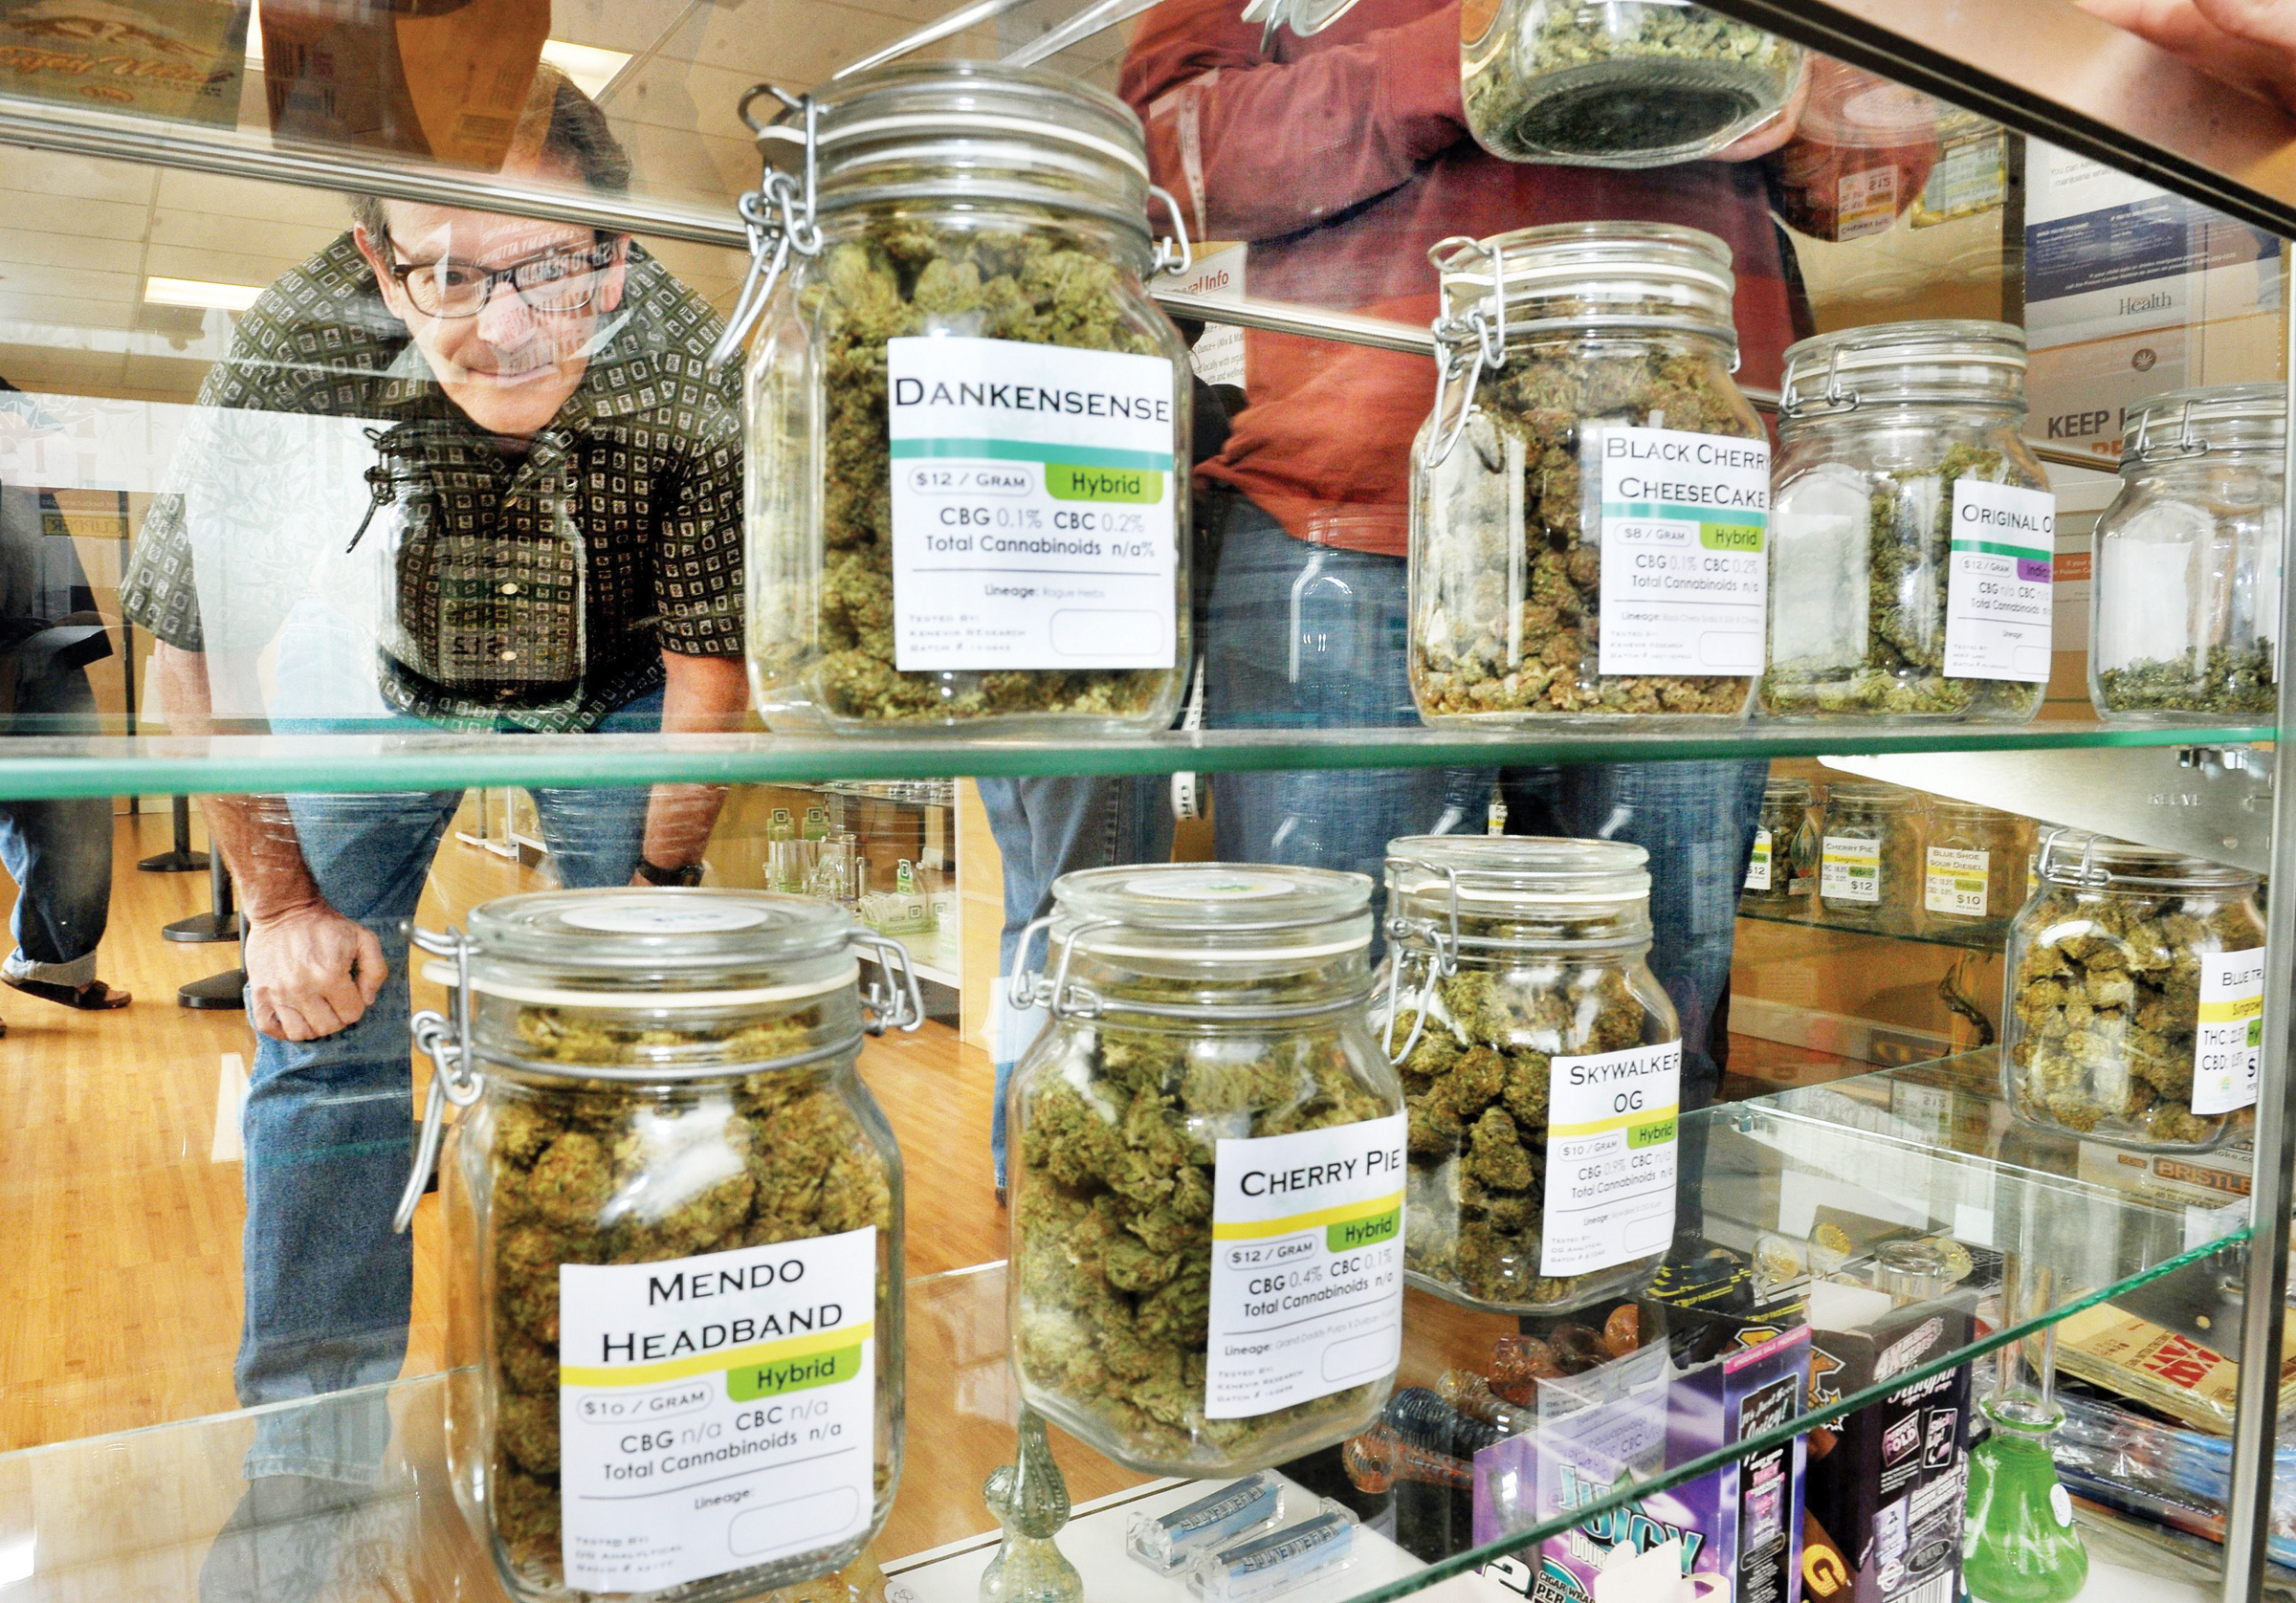 Buscan descriminalizar marihuana en VA